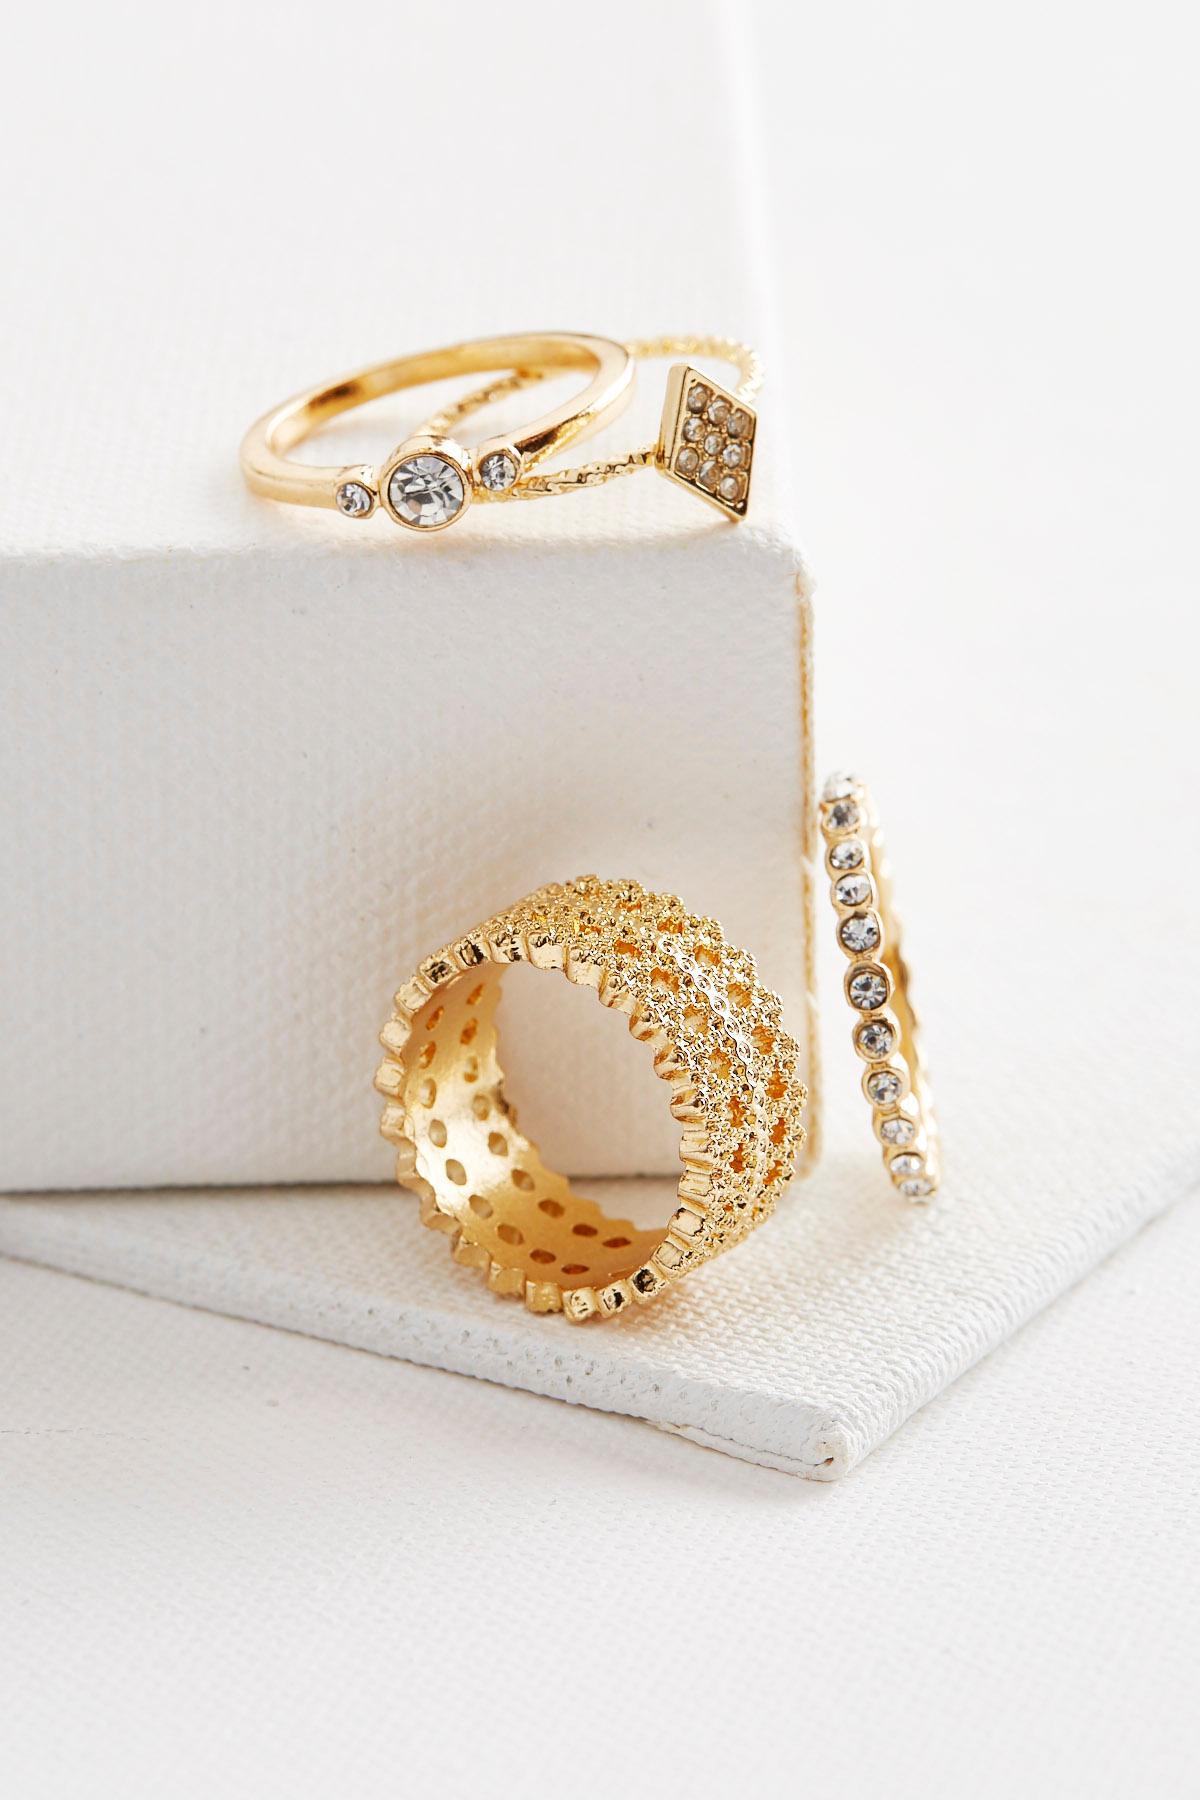 Beaded Filigree Ring Set